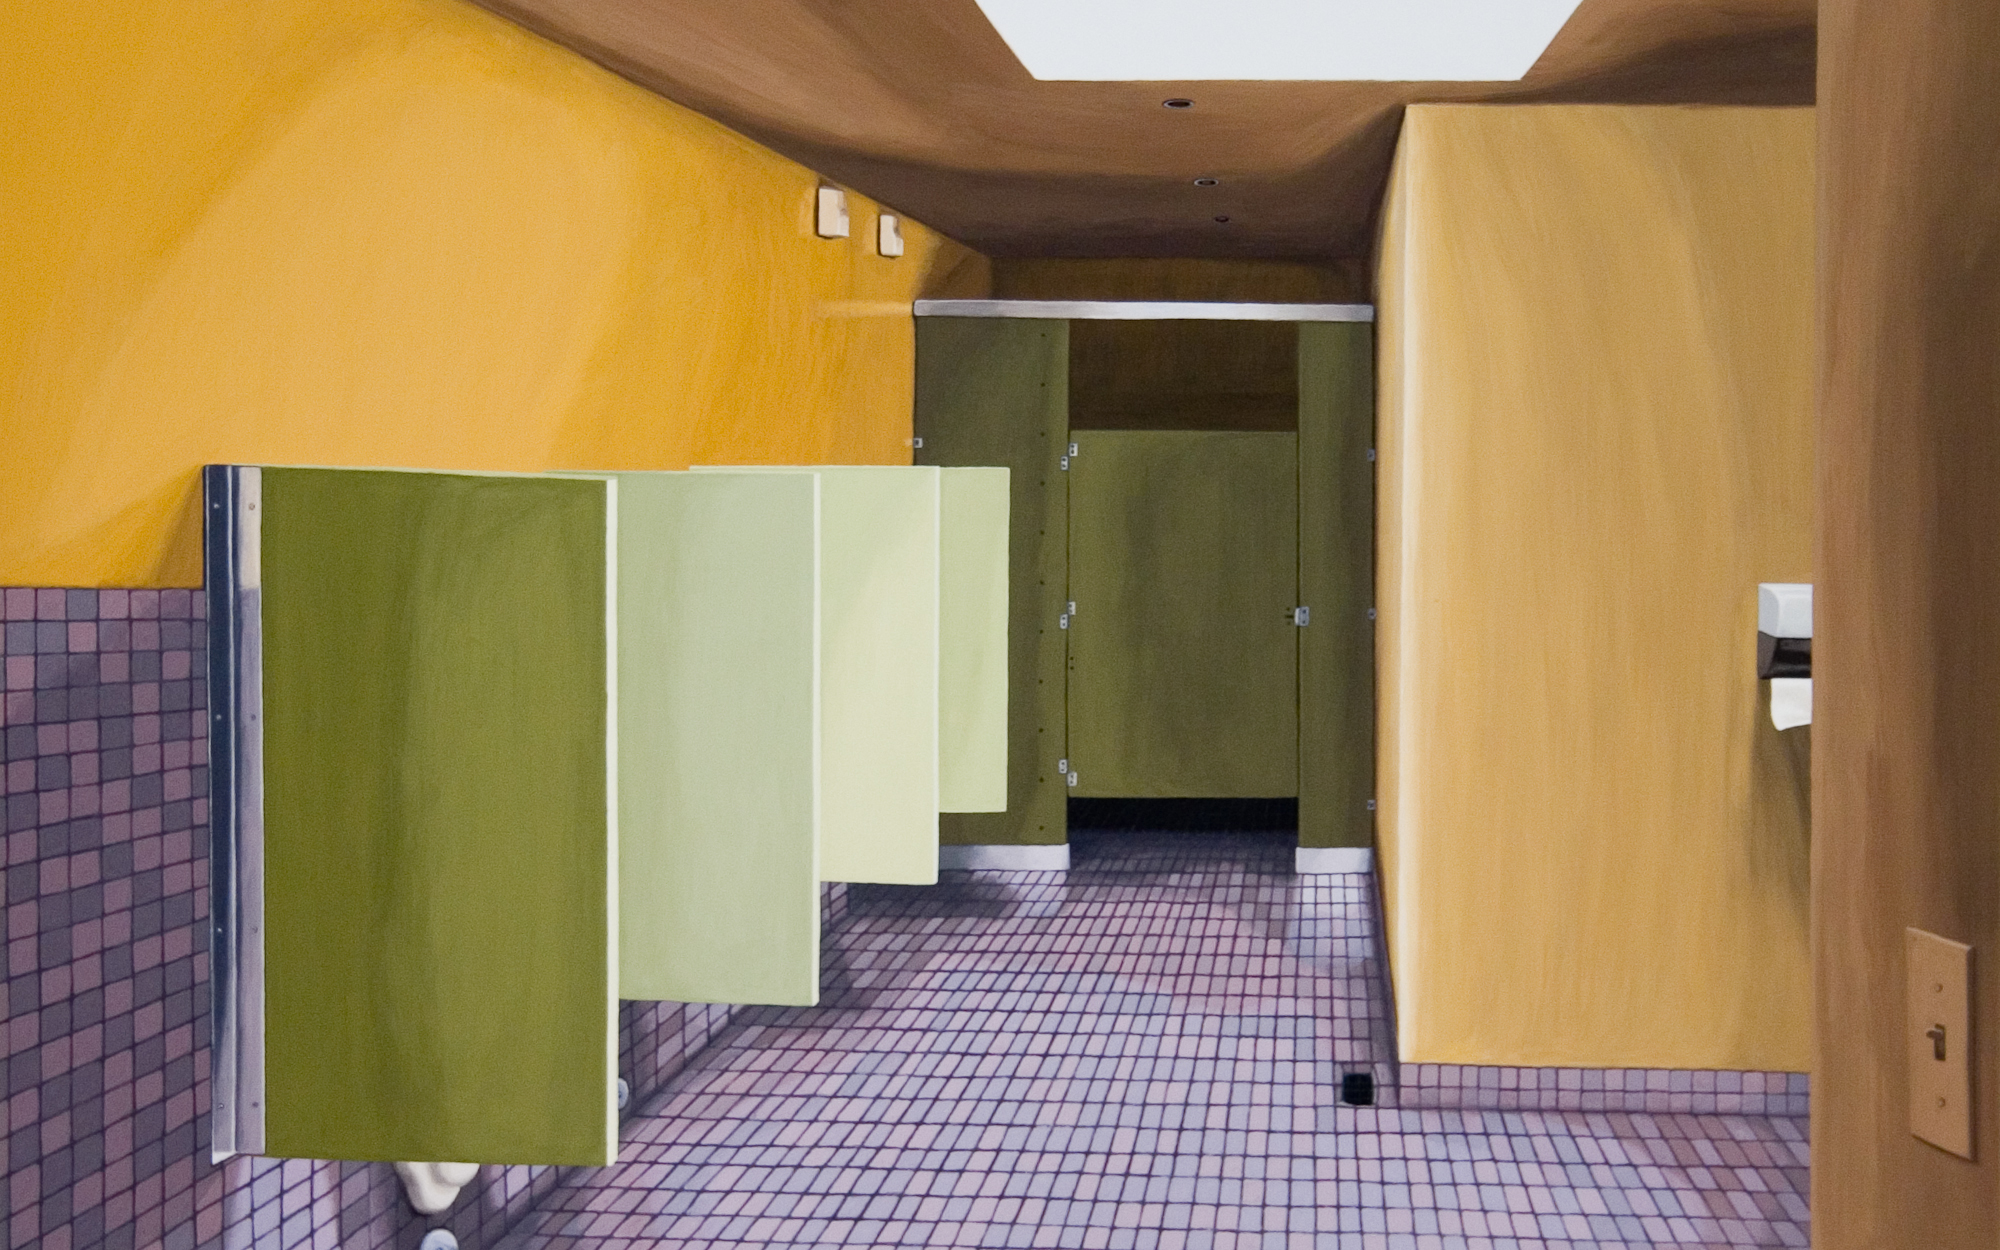 Bathroom #1, 2005, Gouache on Paper, 15 X 22 inches